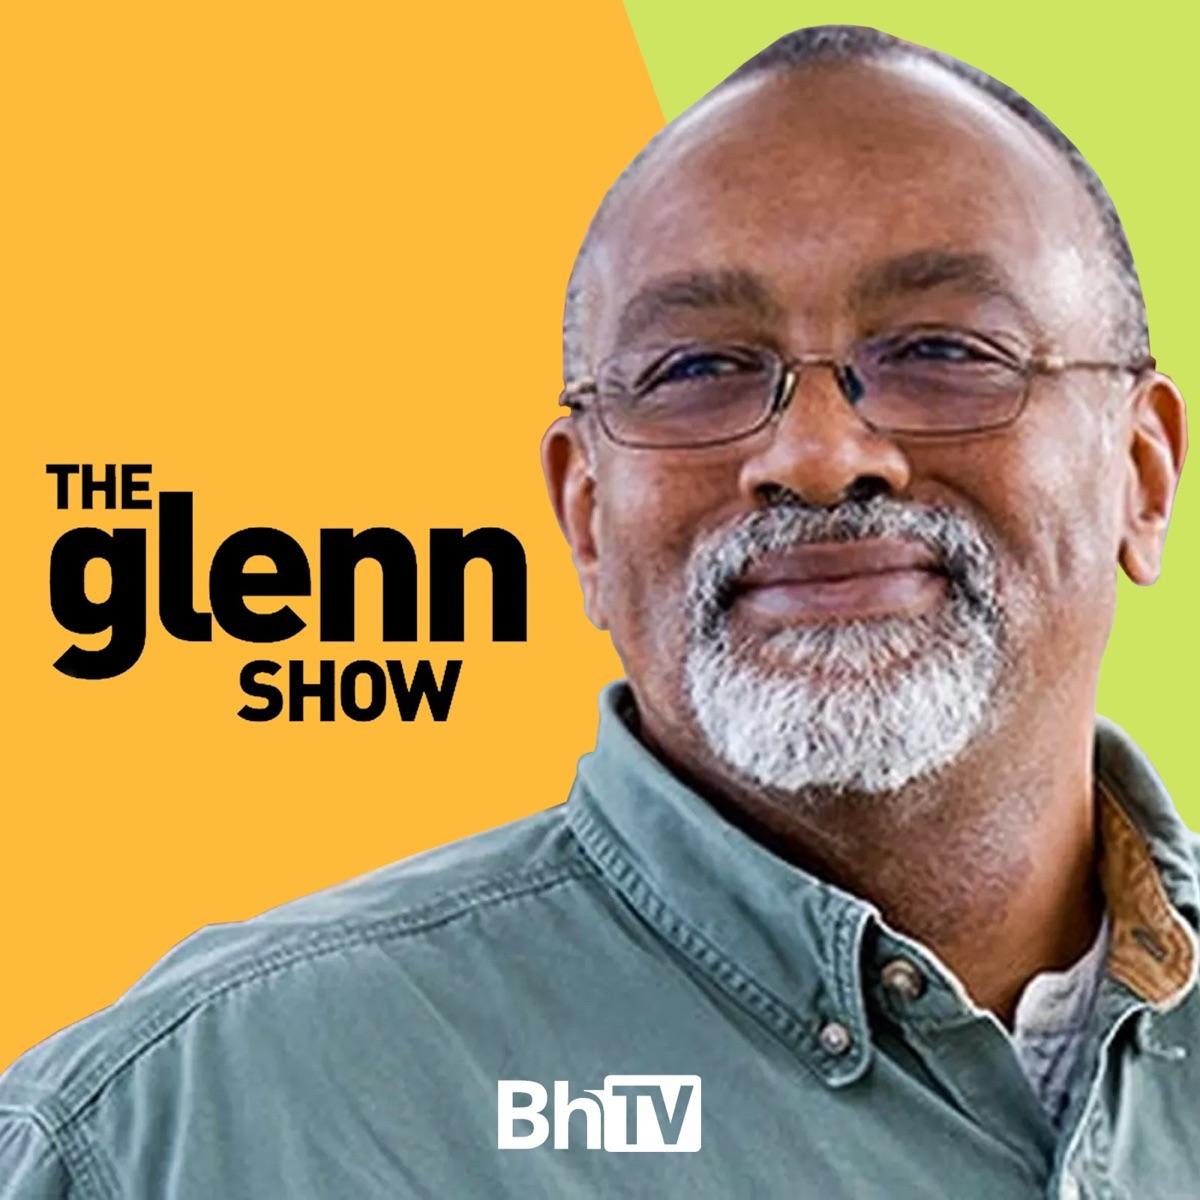 Bloggingheads.tv: The Glenn Show